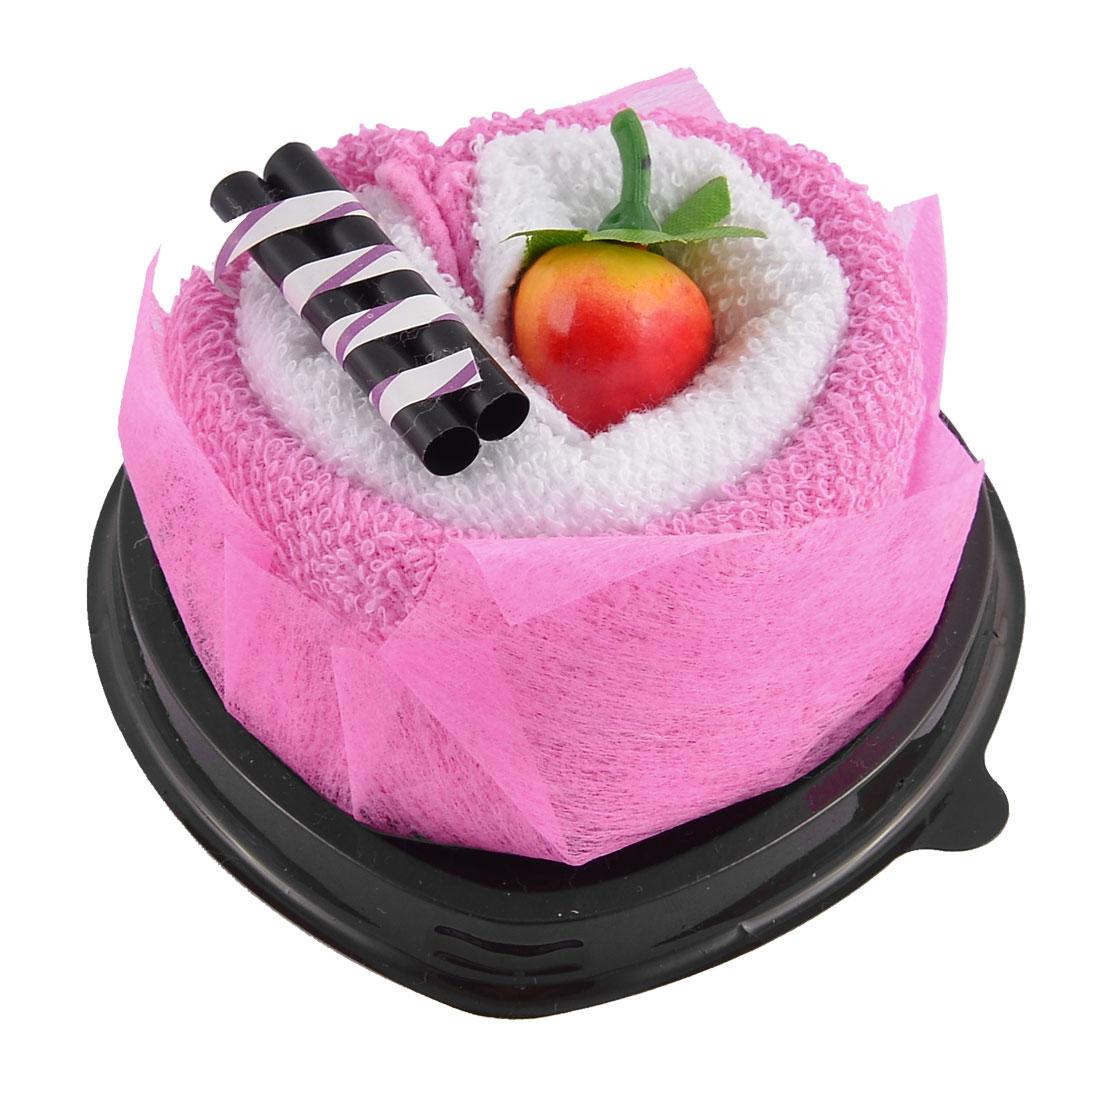 Simulated Strawberry Chocolate Bar Detail Heart Shape Cupcake Towel Washcloth Decor Gift Fuchsia